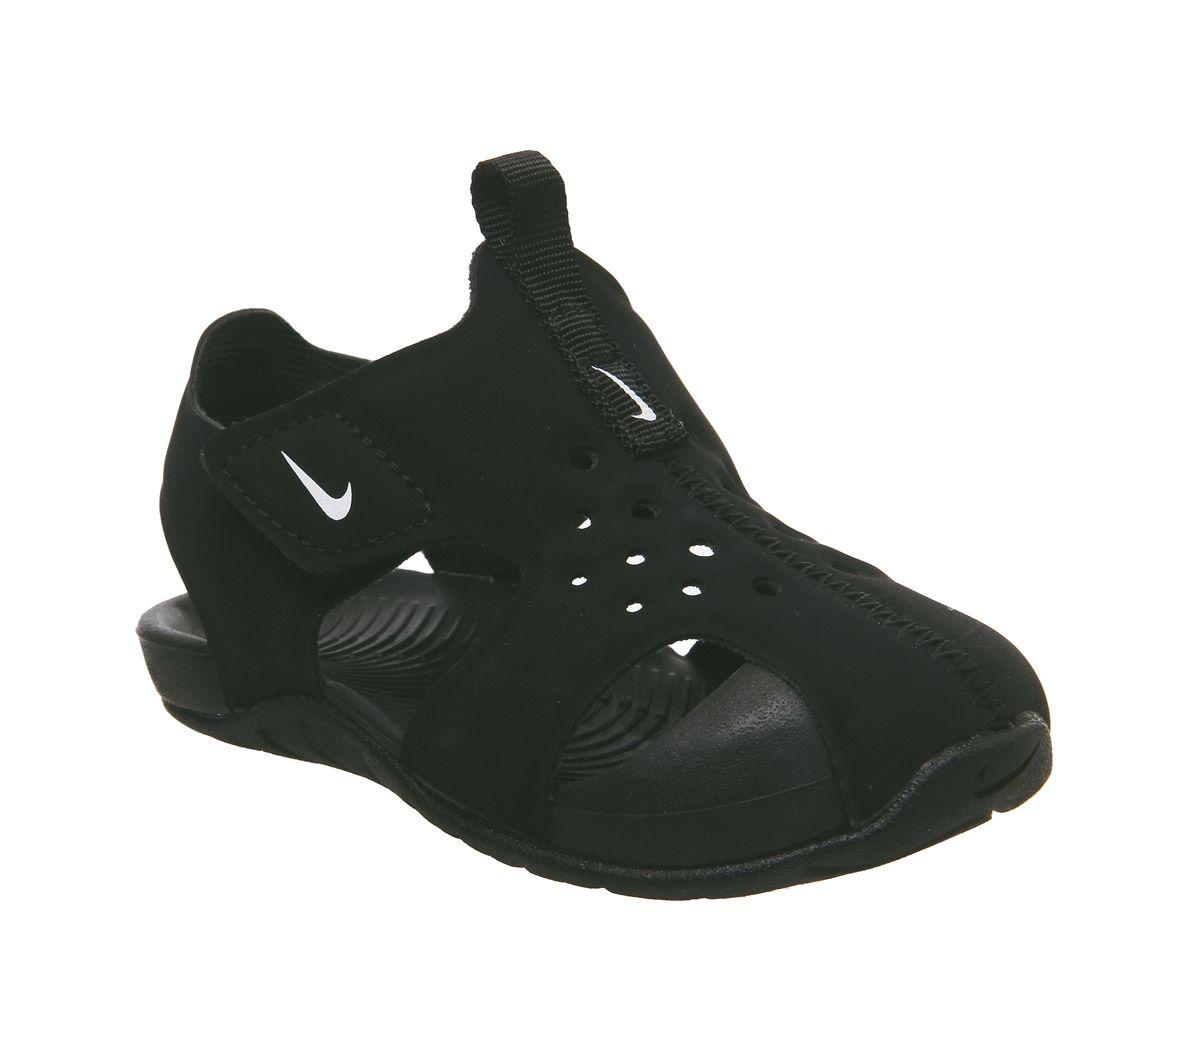 pretty nice 6455a 4003f Nike Sunray Protect Td Sandals Black - Unisex